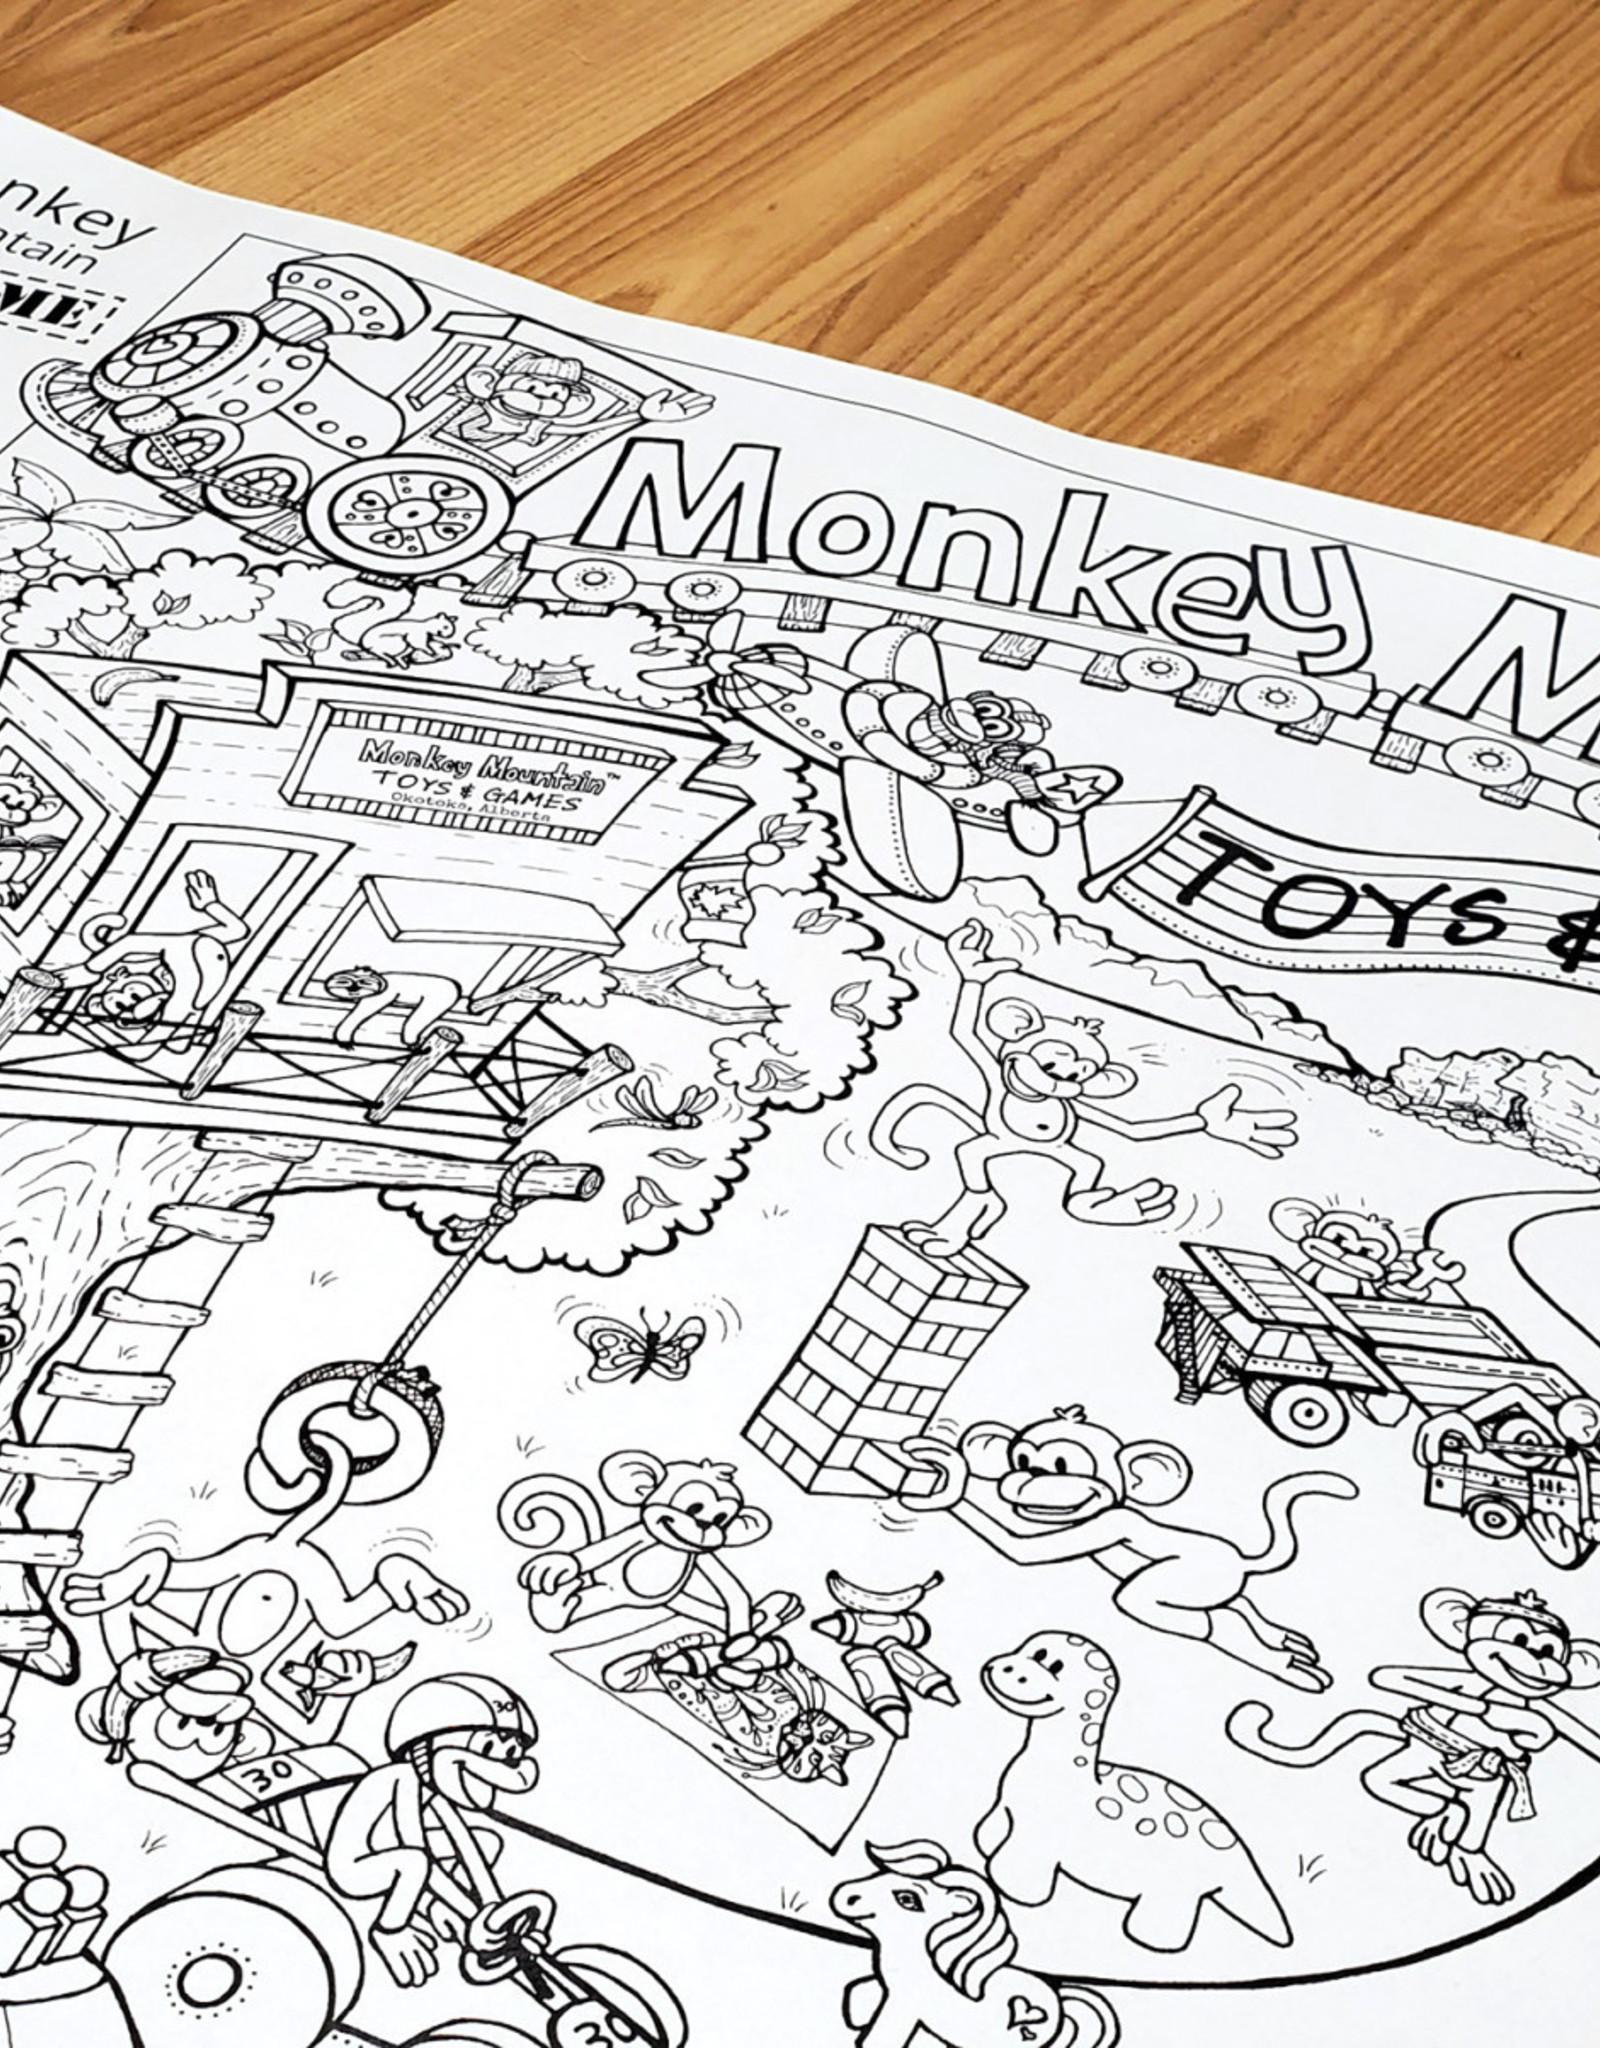 Crystal Salamon Monkey Mountain Seek & Find